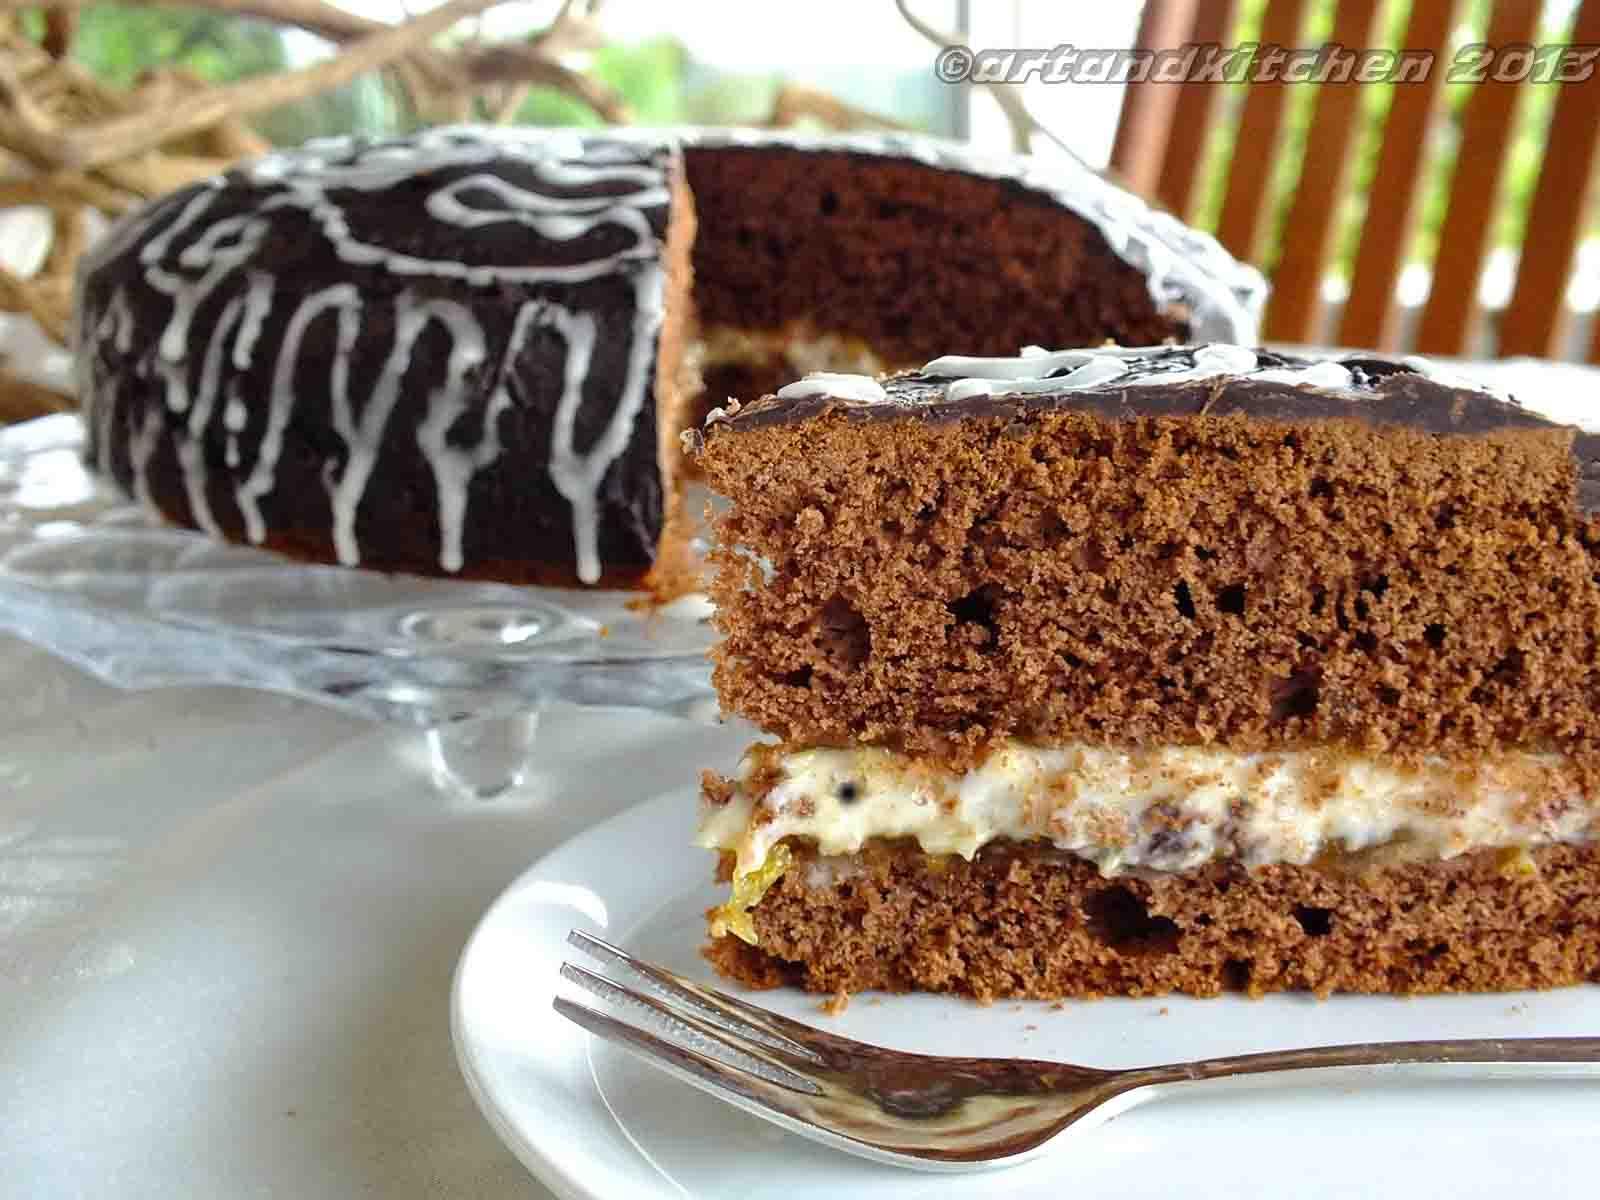 Dark Chocolate Orange Cake With Cannoli Filling